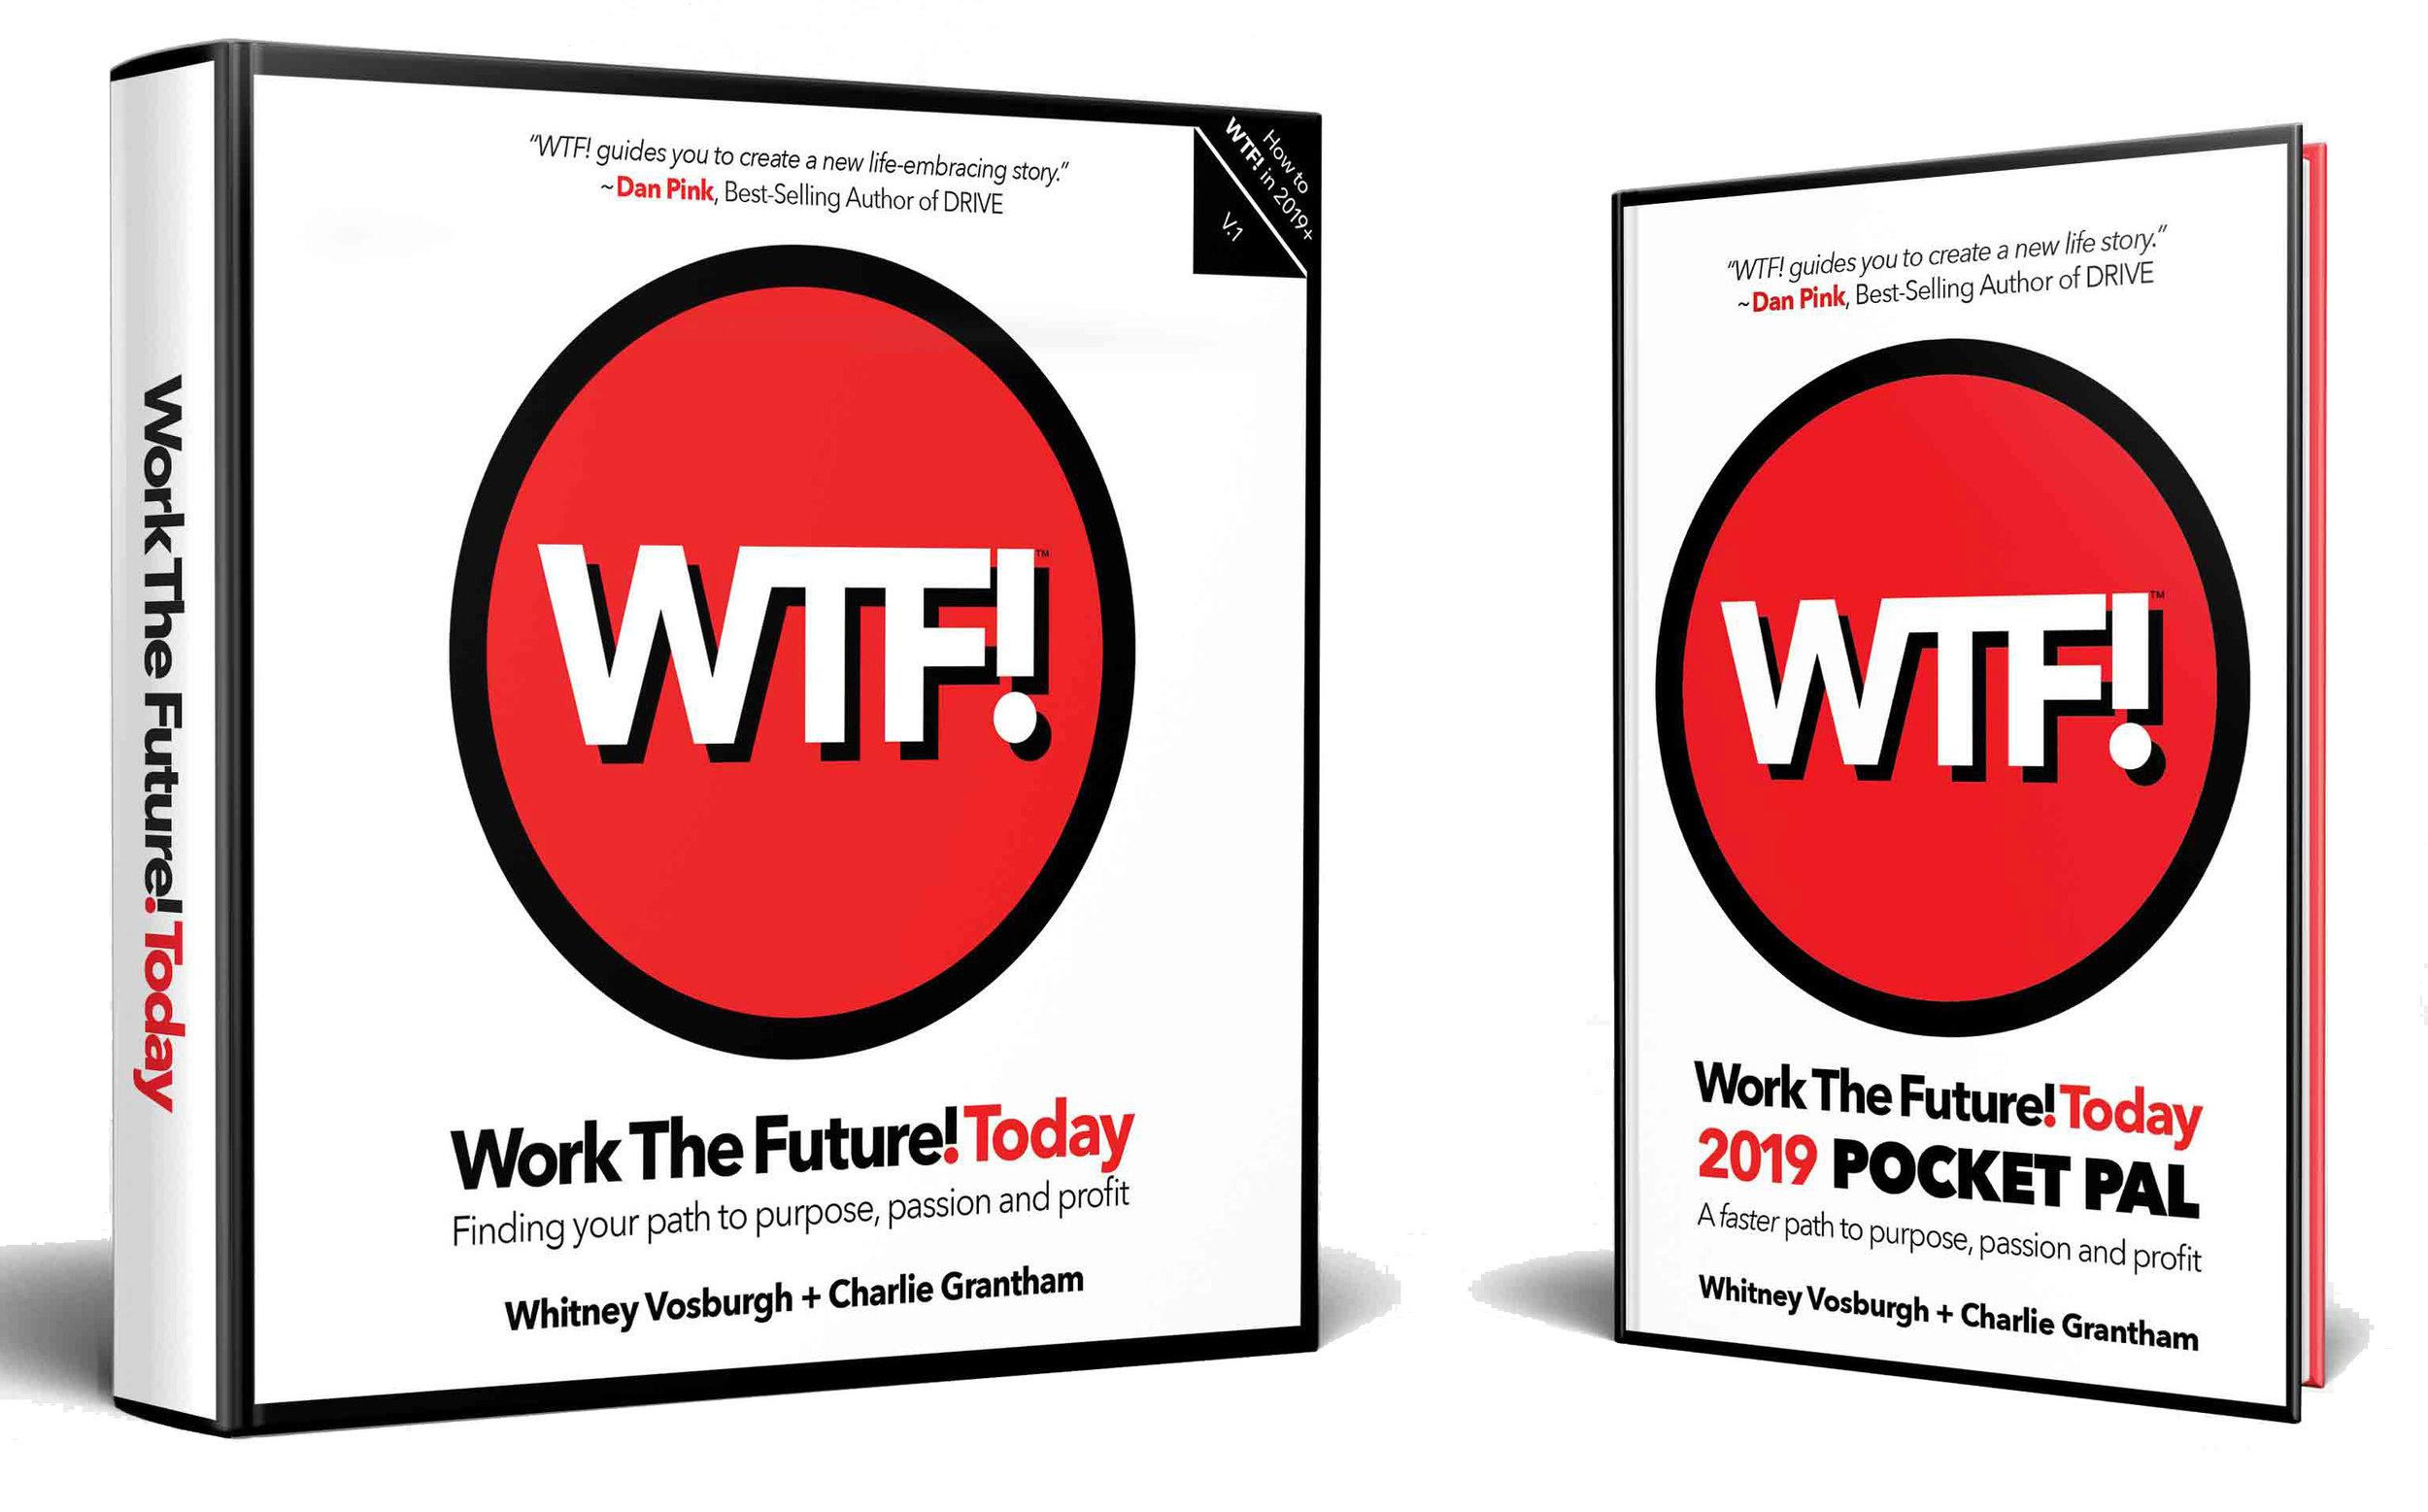 WTF! 2 books cropped wh bgnd.jpg